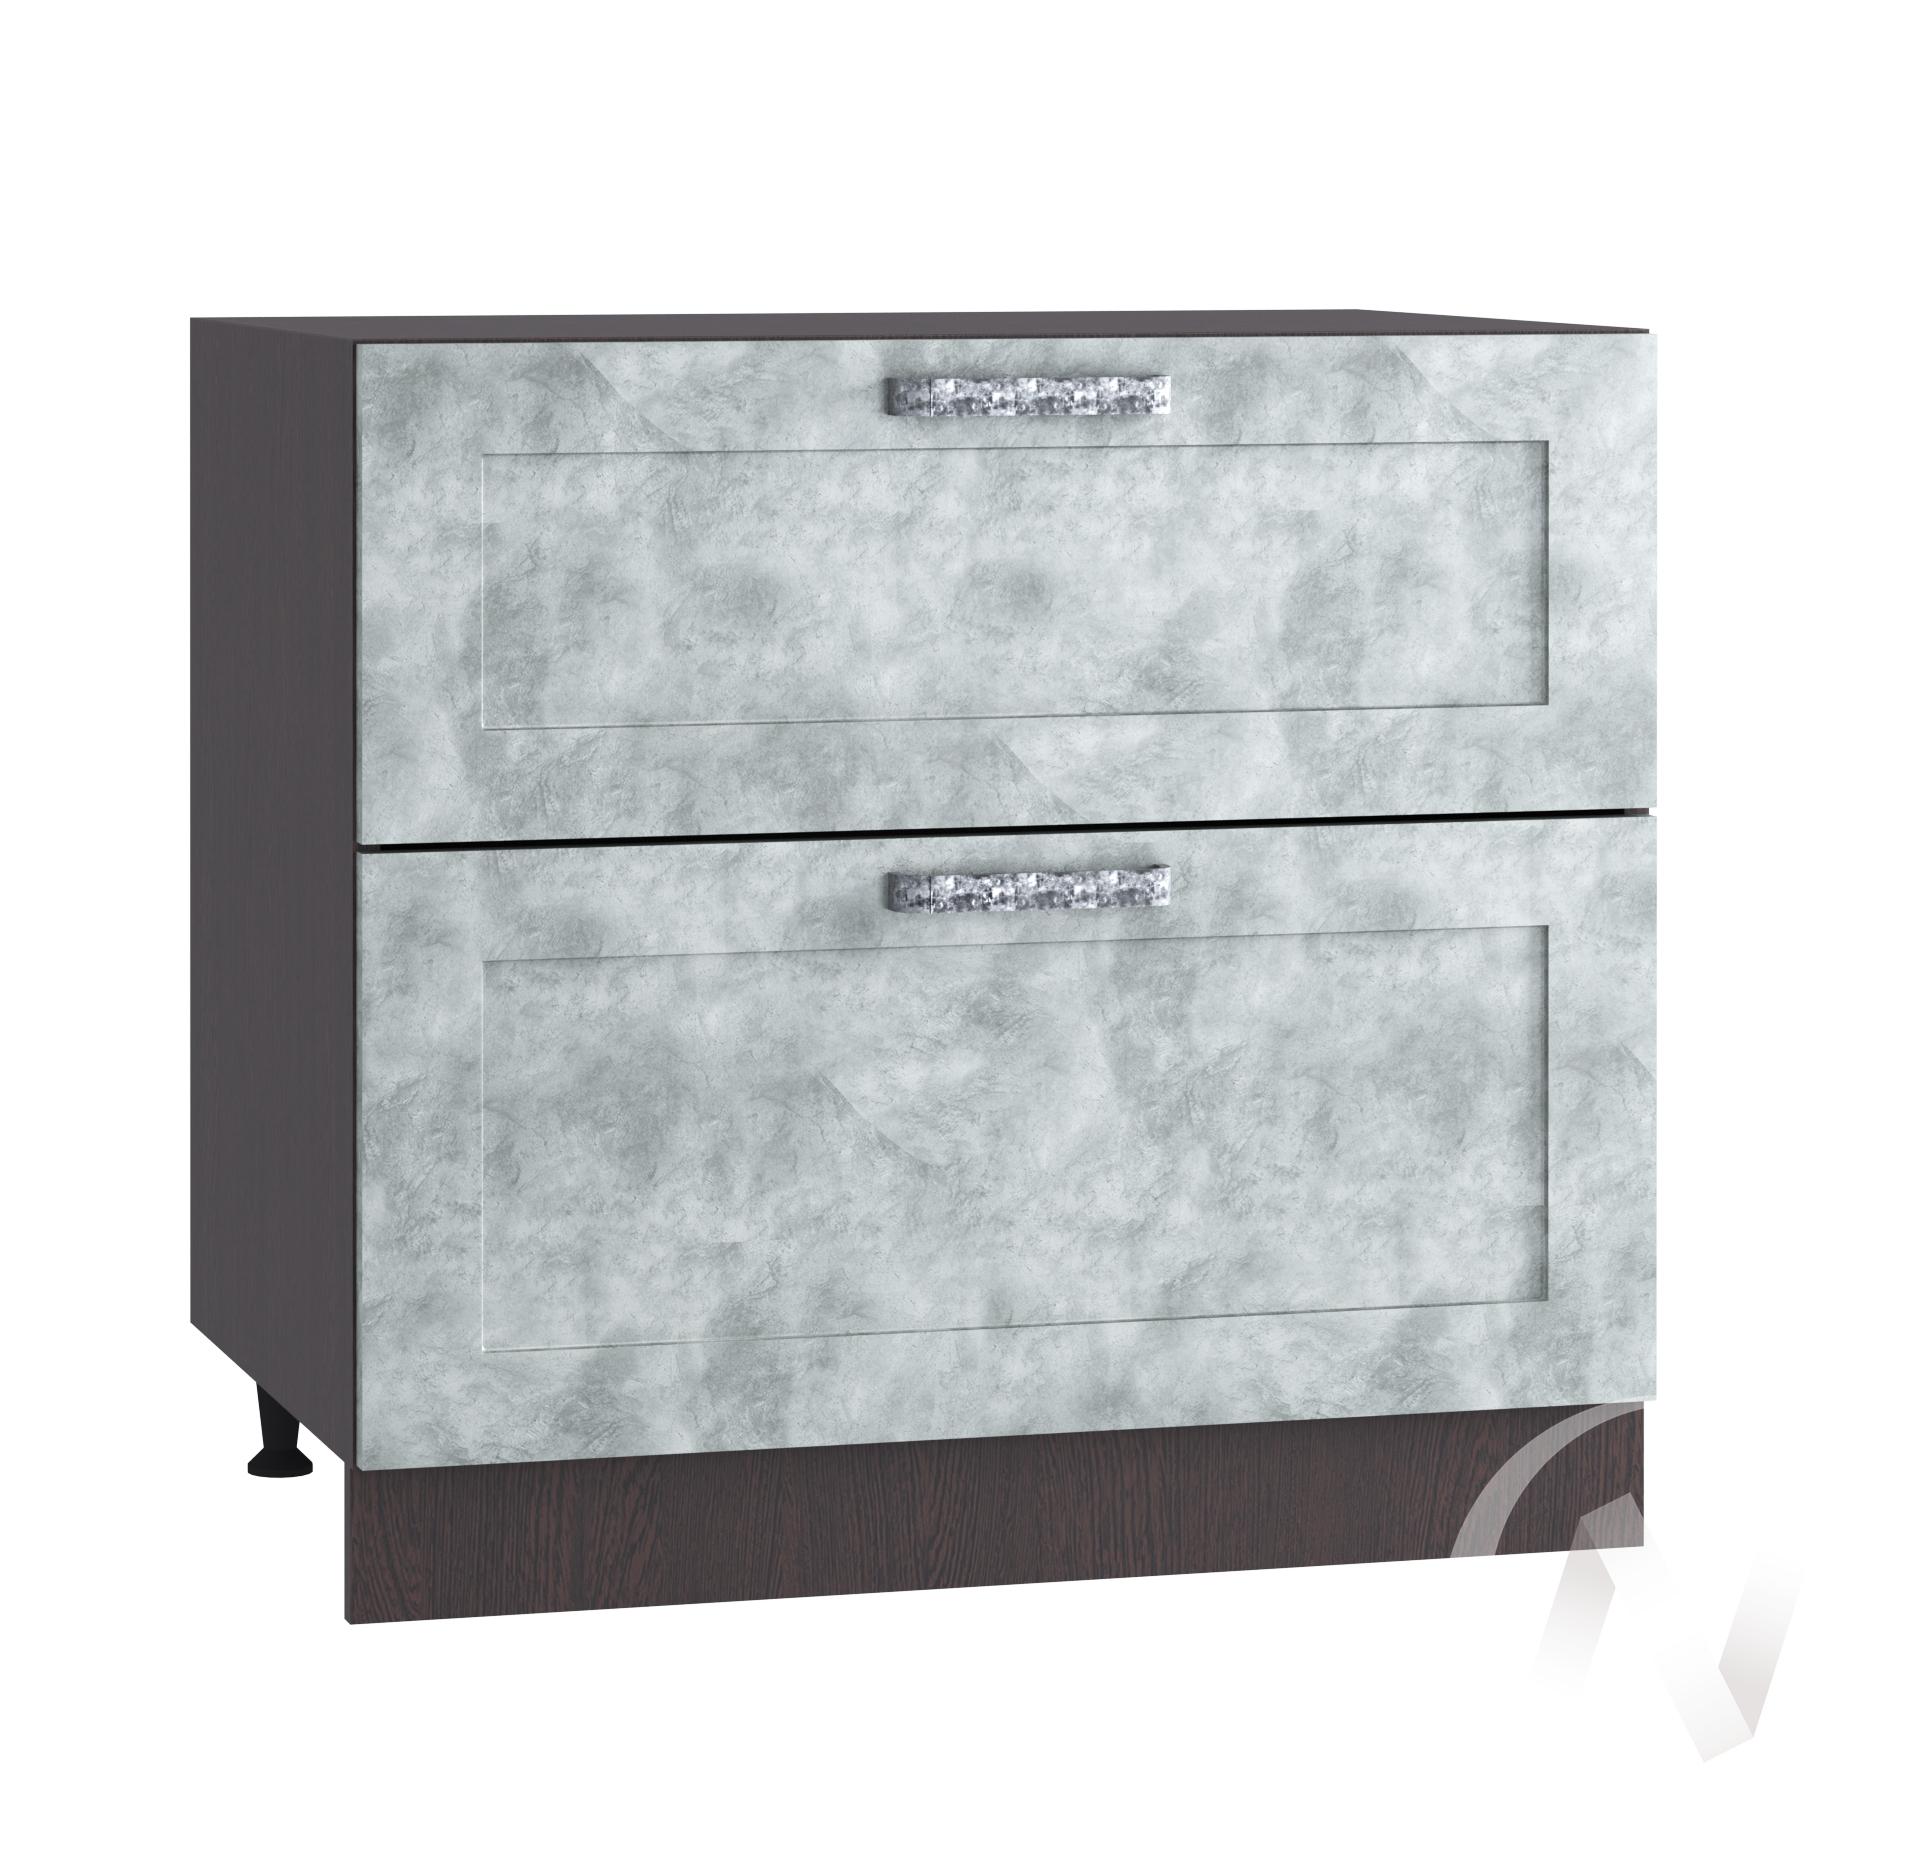 "Кухня ""Лофт"": Шкаф нижний с 2-мя ящиками 800, ШН2Я 800 (Бетон серый/корпус венге)"